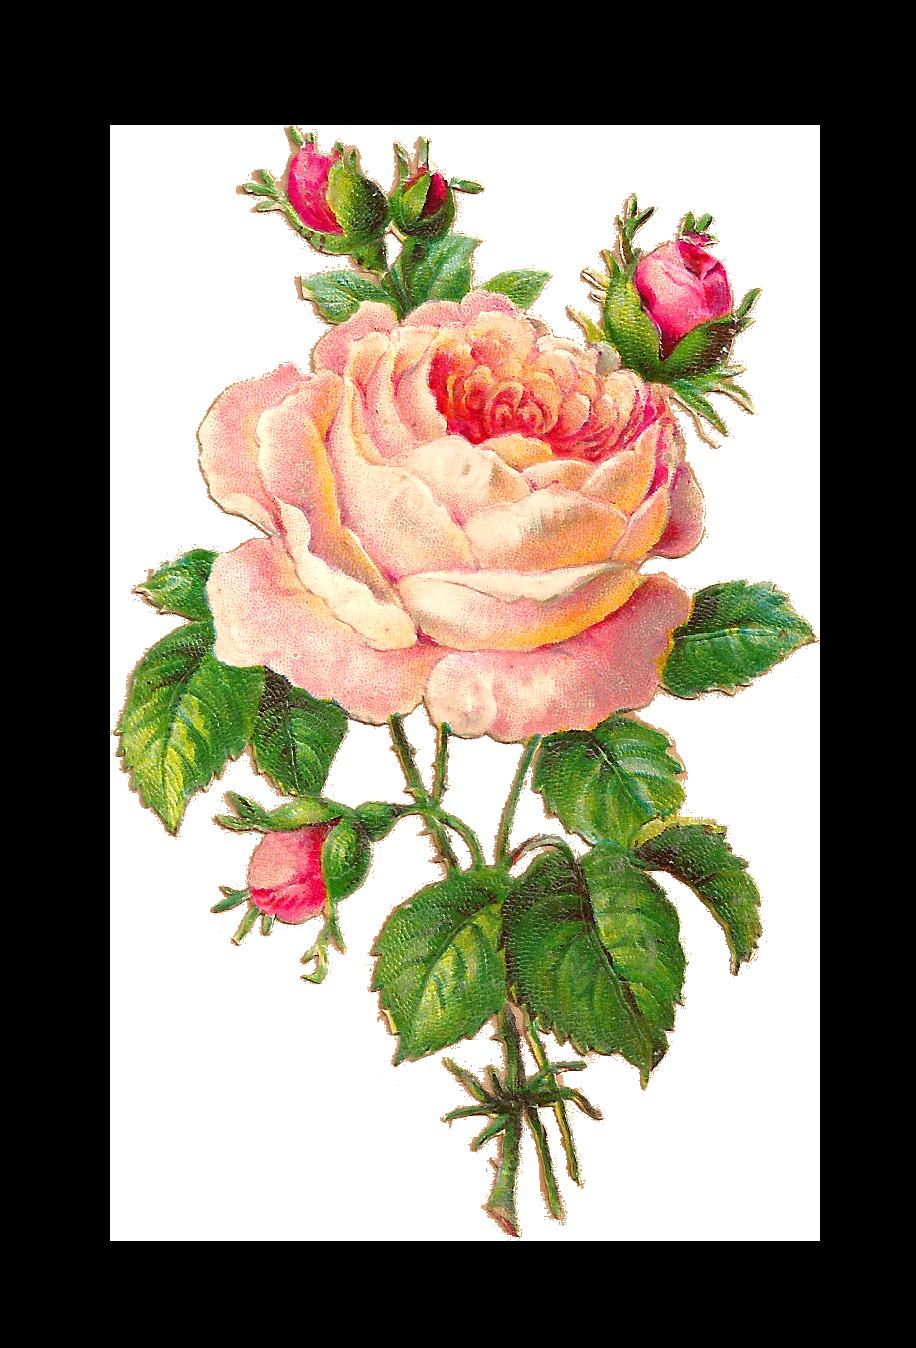 Antique Images Flower Scrapbooking Pink Rose With Buds Vintage